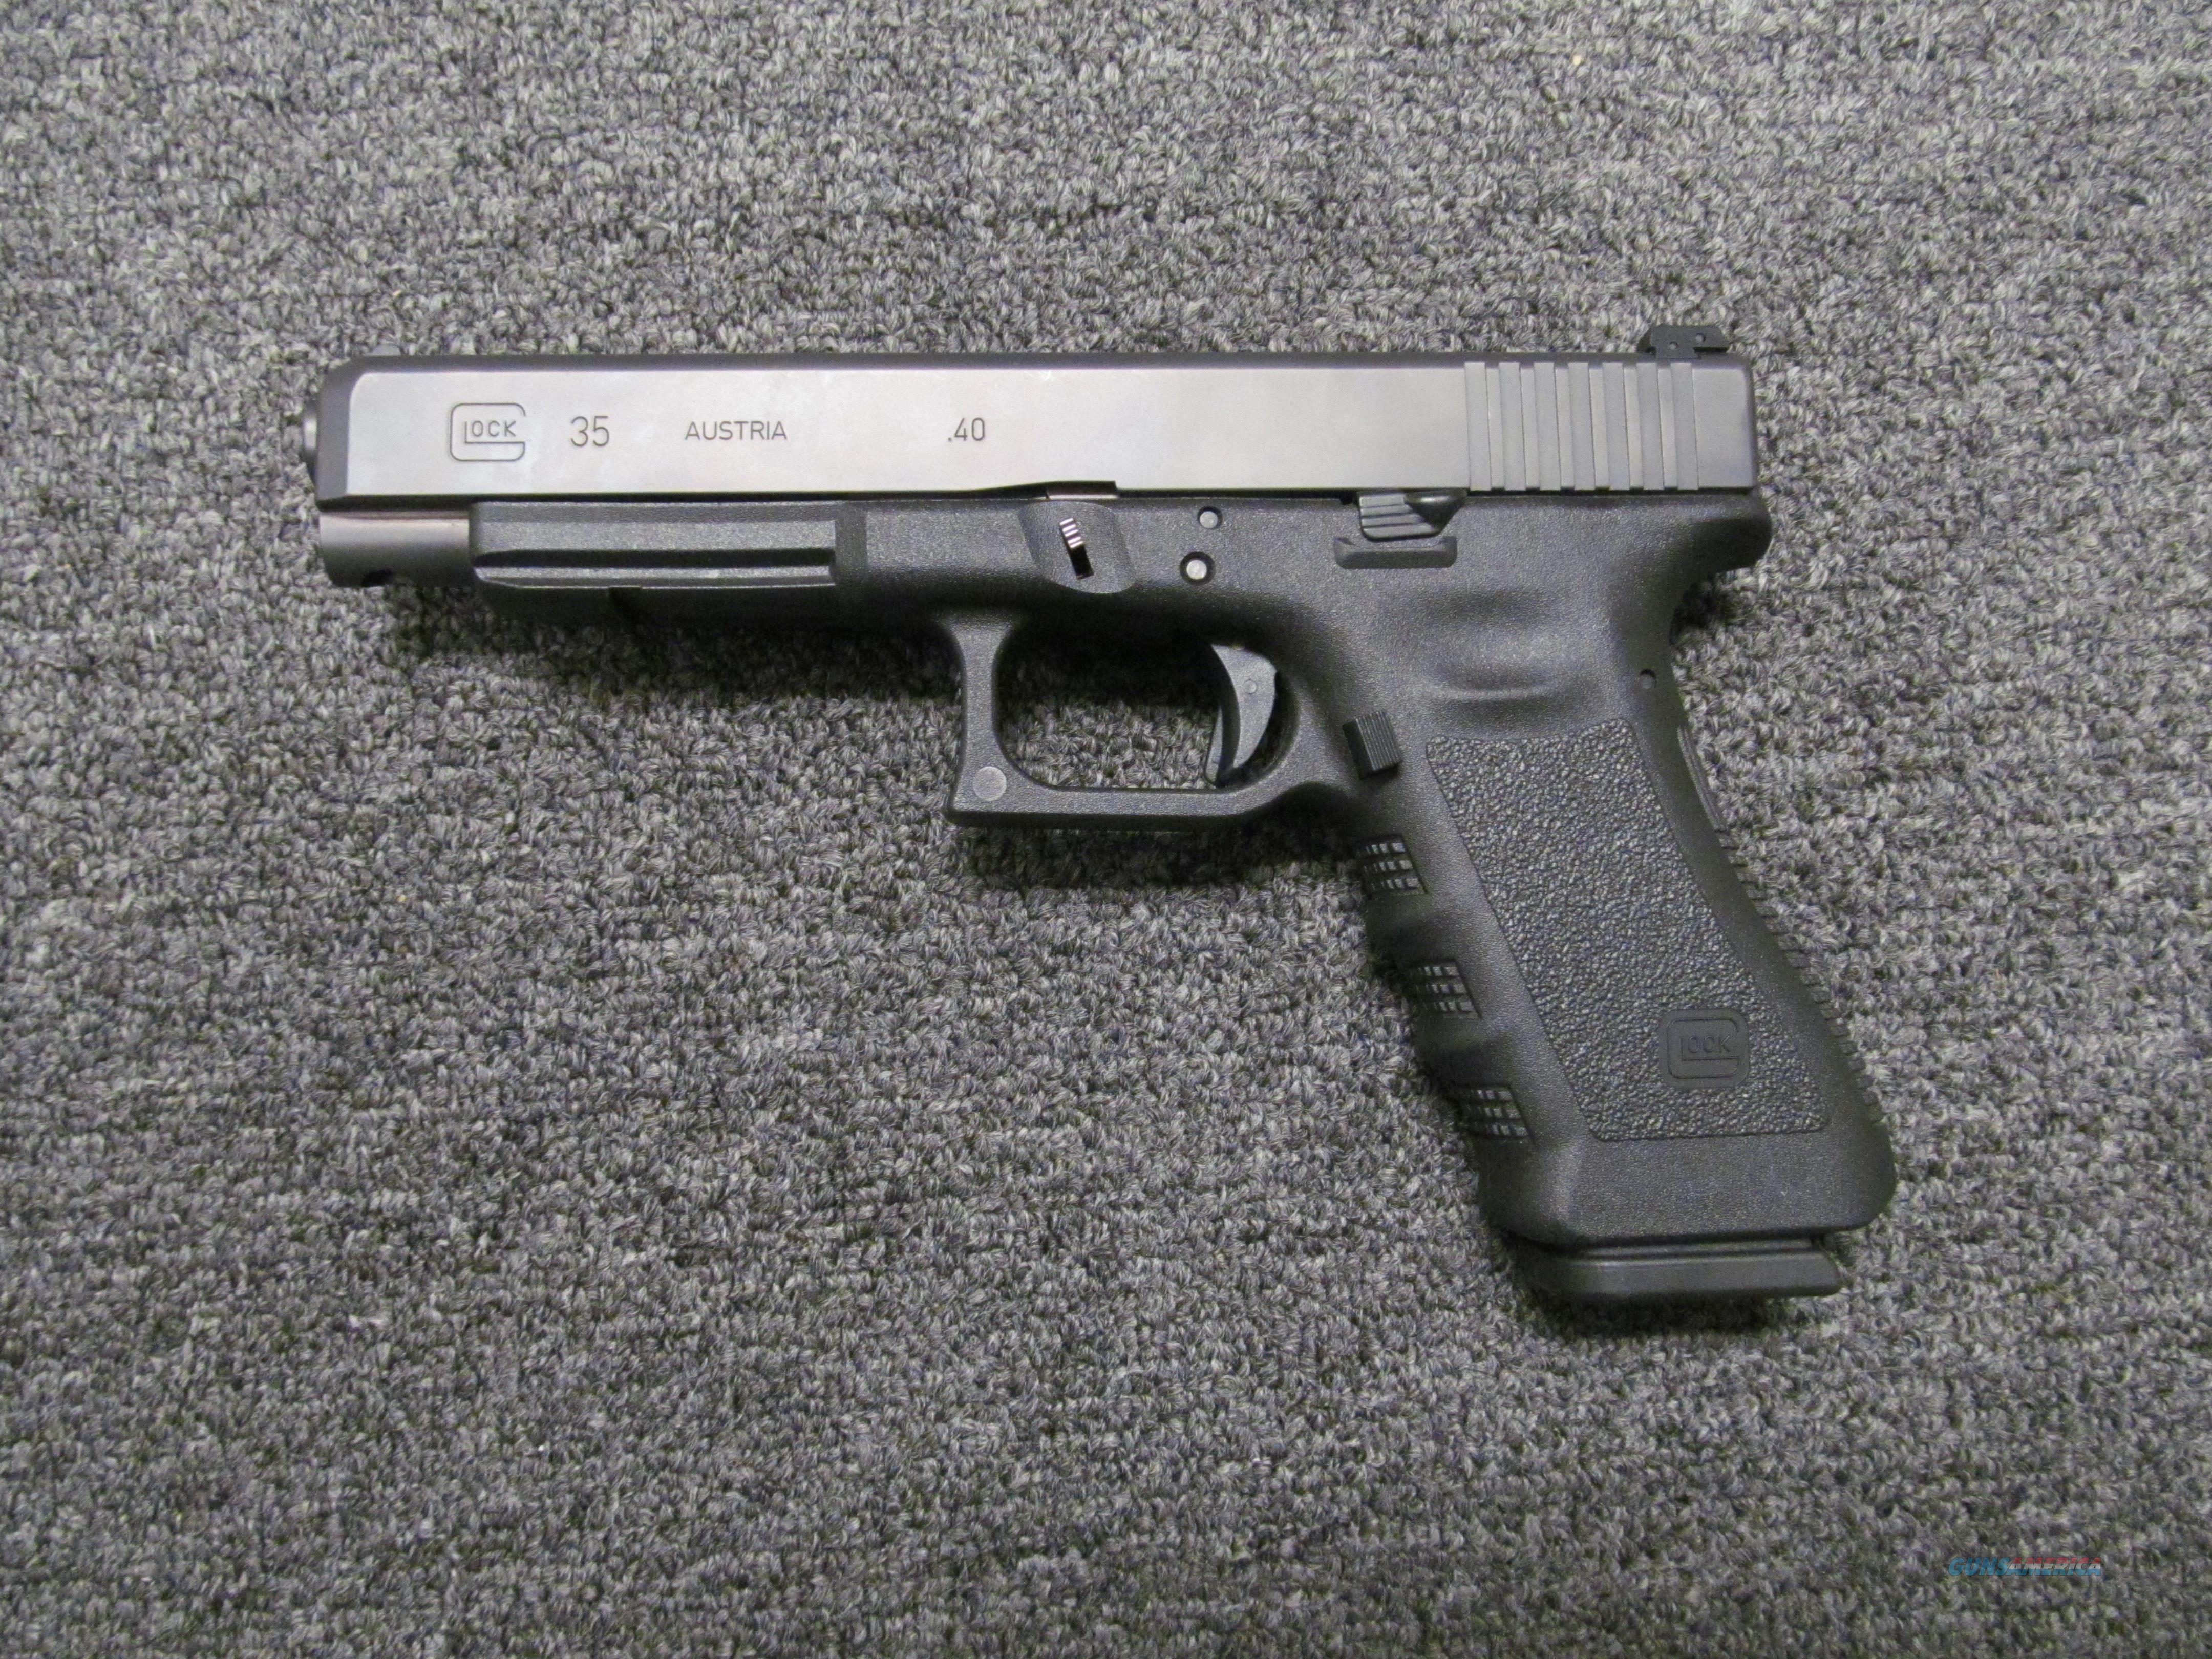 Glock 35 w/Internal LaserMax red dot laser .40 S&W  Guns > Pistols > Glock Pistols > 35